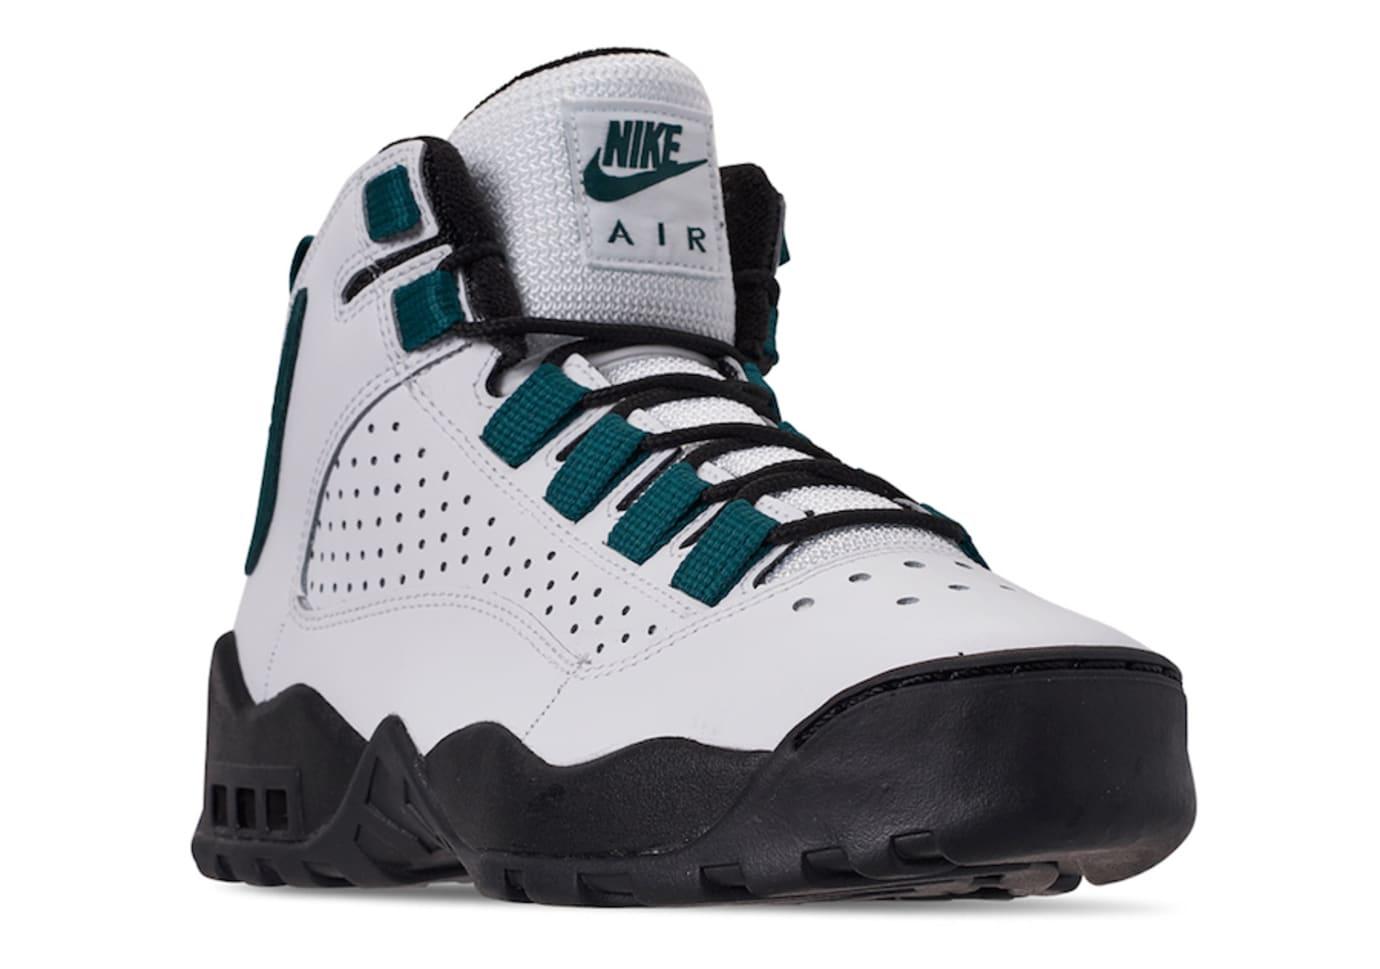 Nike Air Darwin 'White/Teal/Black' AJ9710-100 (Angle)